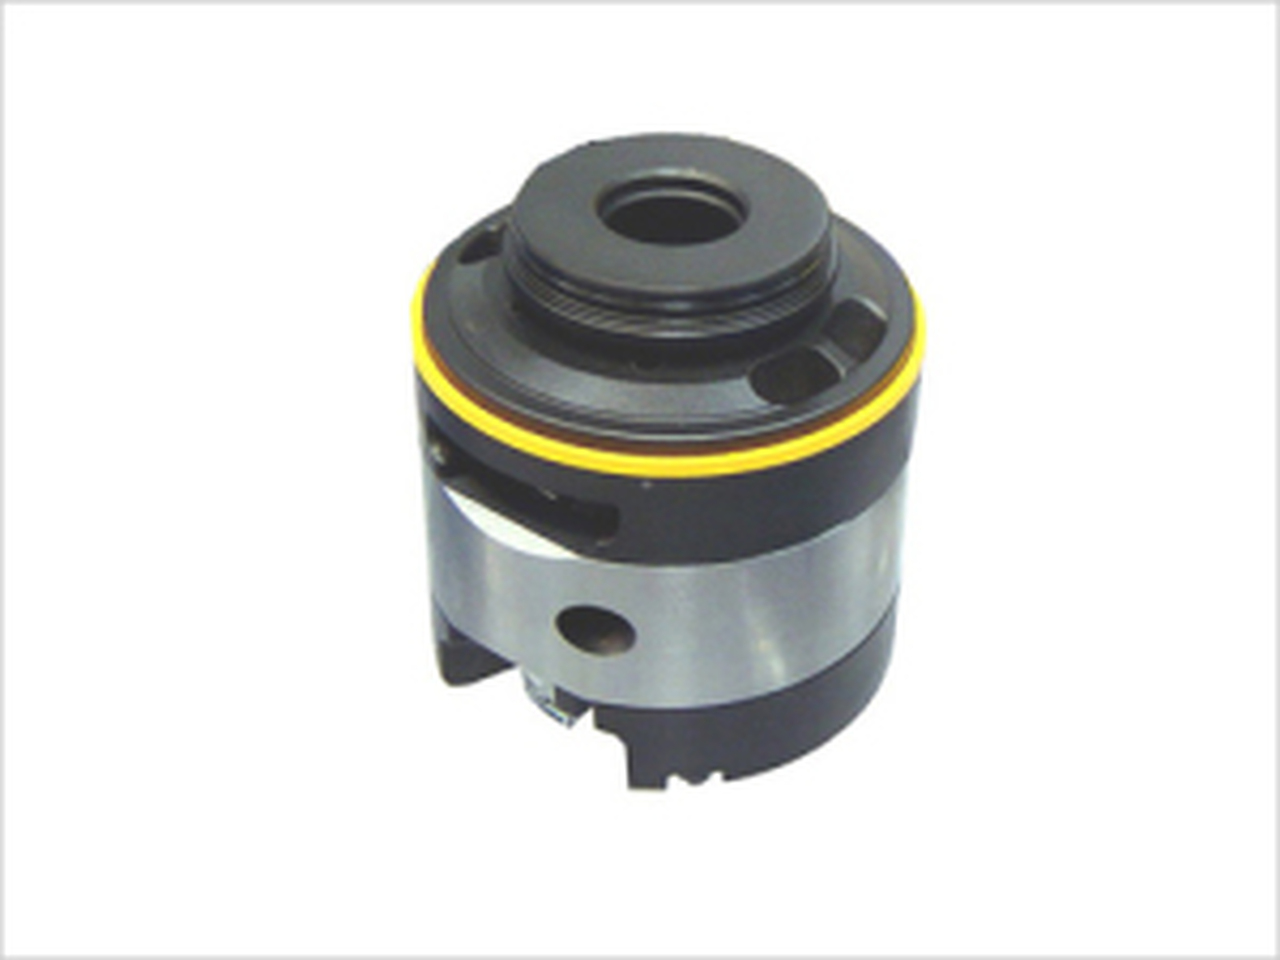 02-137566 Vickers Hydraulic Vane Pump Replacement Cartridge Kit V20 12 GPM Pump